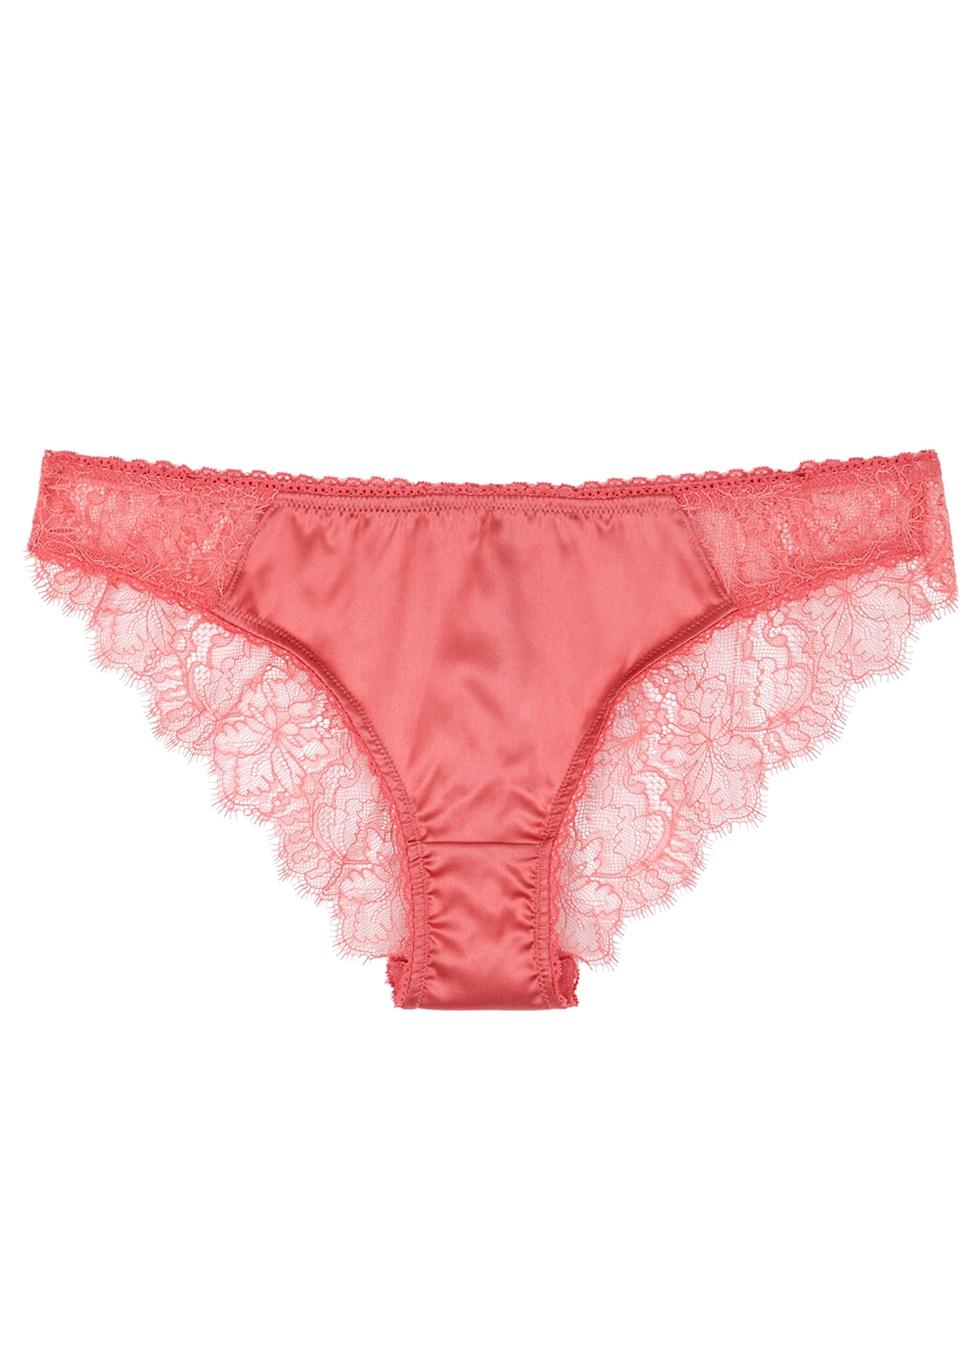 Gigi Giggling pink lace briefs - Stella McCartney